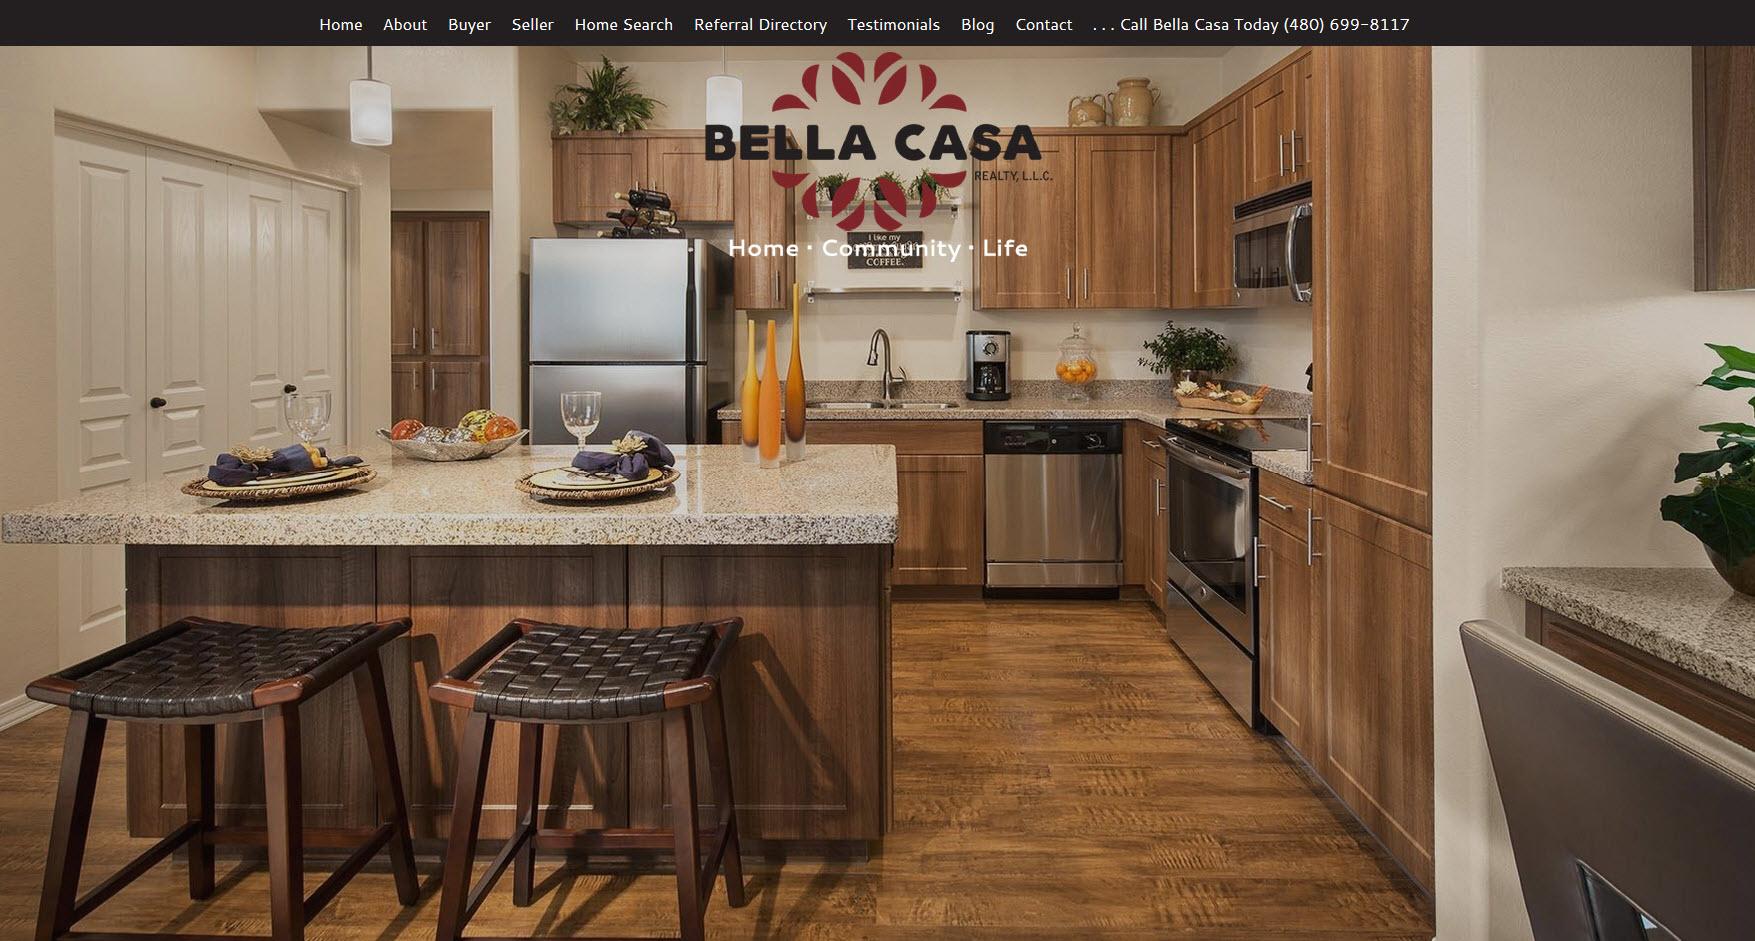 Real Estate Website Design - Bella Casa Realty Chandler, AZ